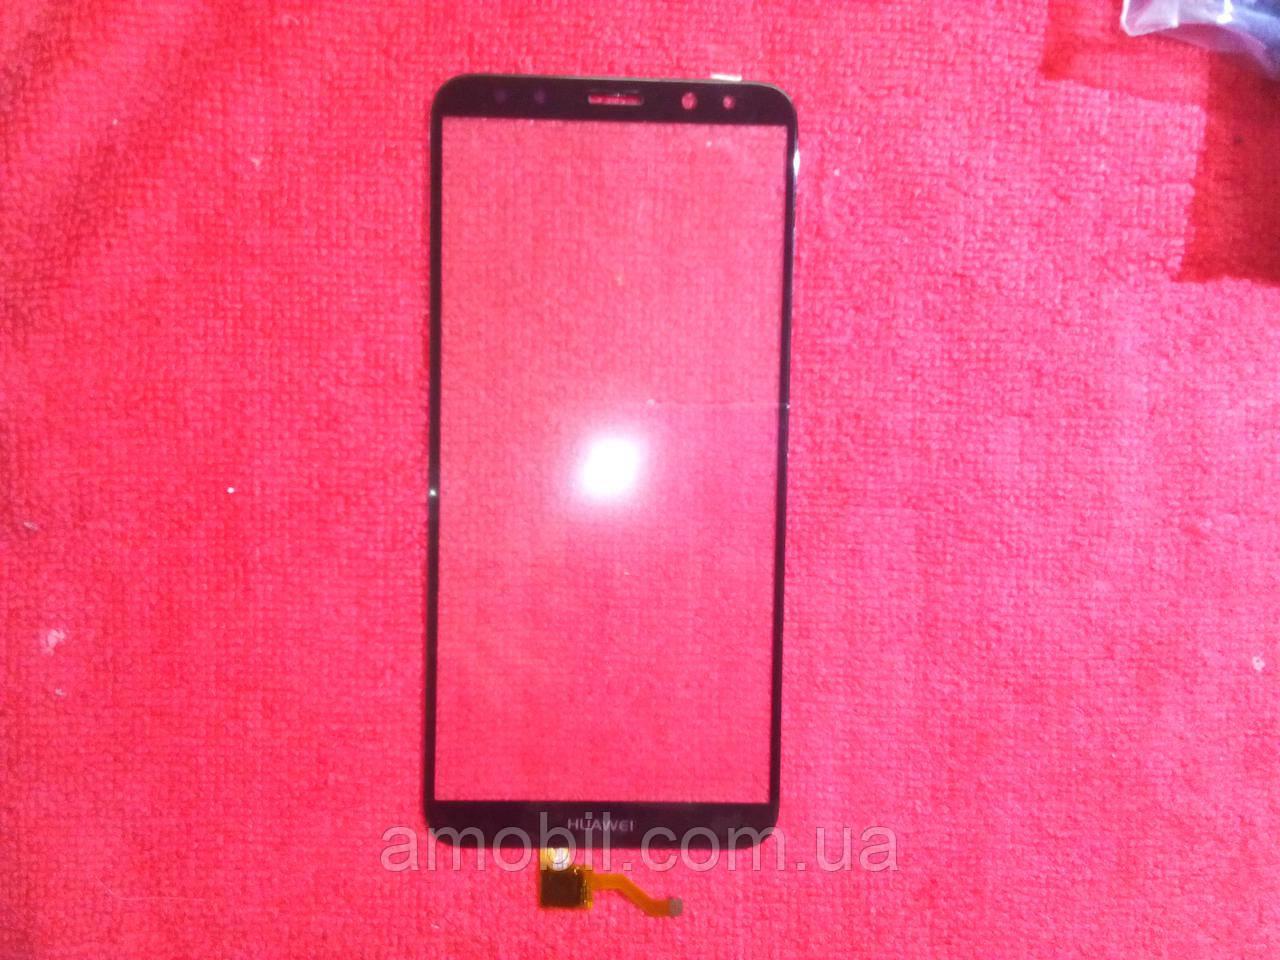 Сенсор Huawei G10 RNE-AL00 / G10 Plus / Mate 10 Lite / Honor 9i / Nova 2i black orig